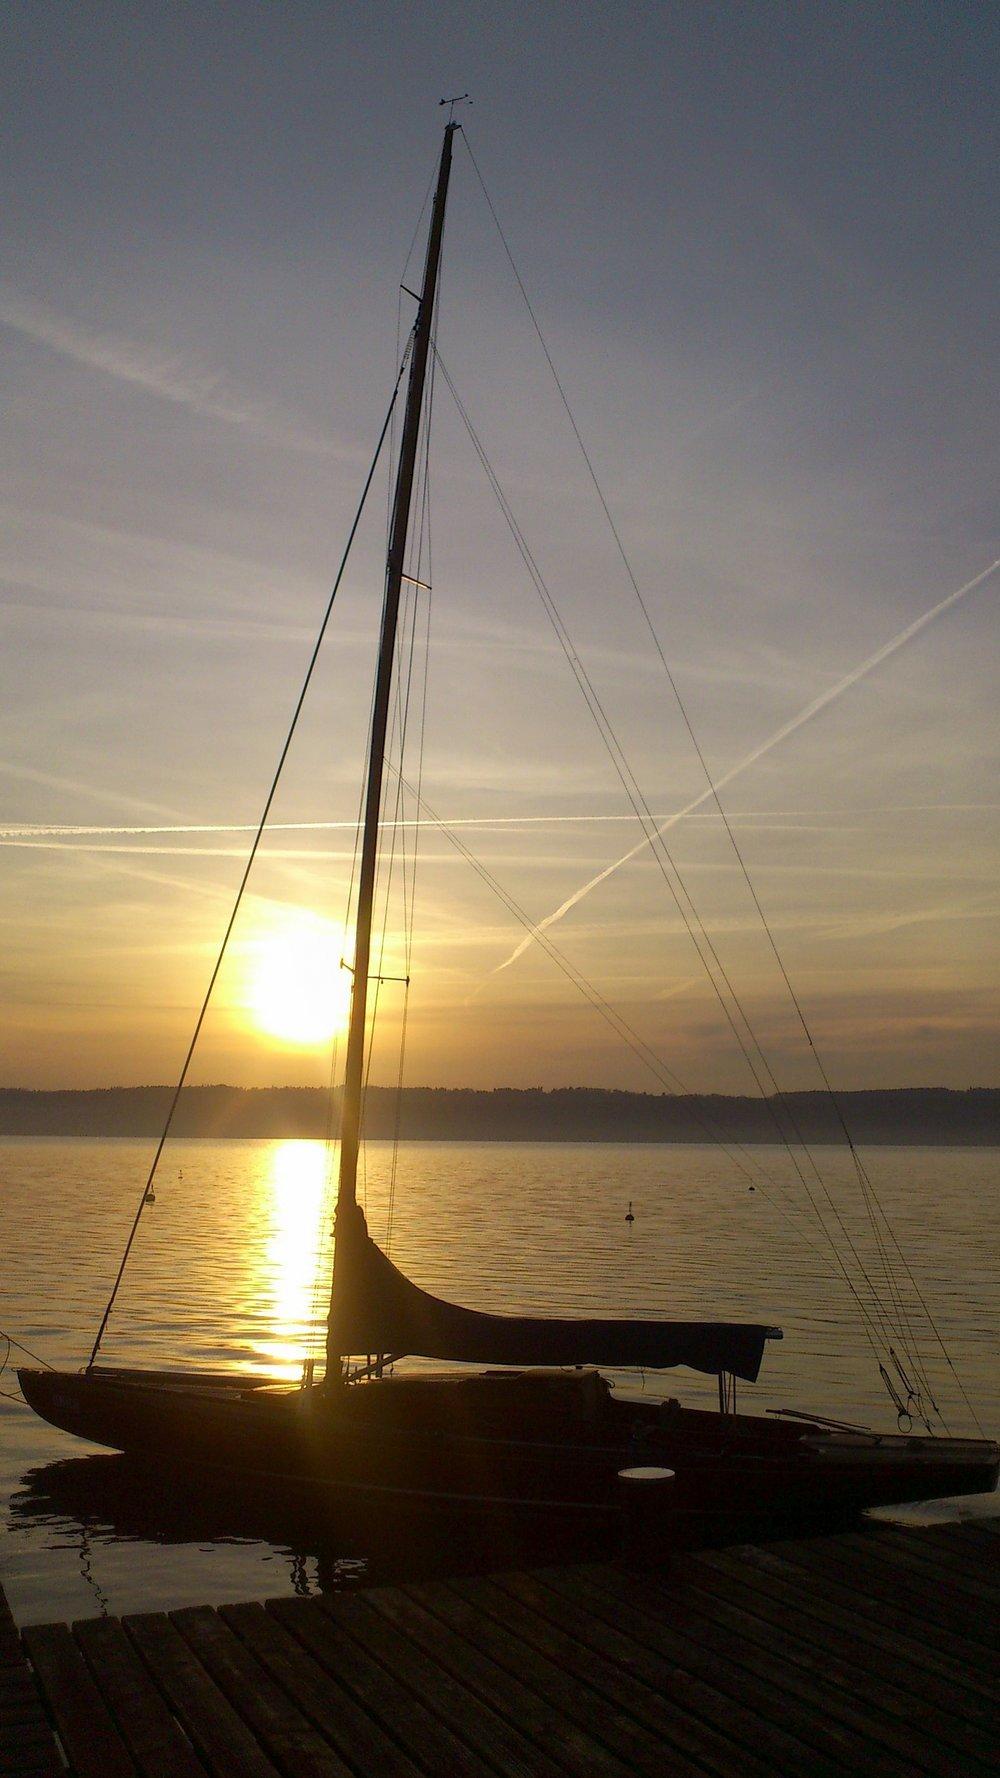 Bild 4 - Sonnenaufgang